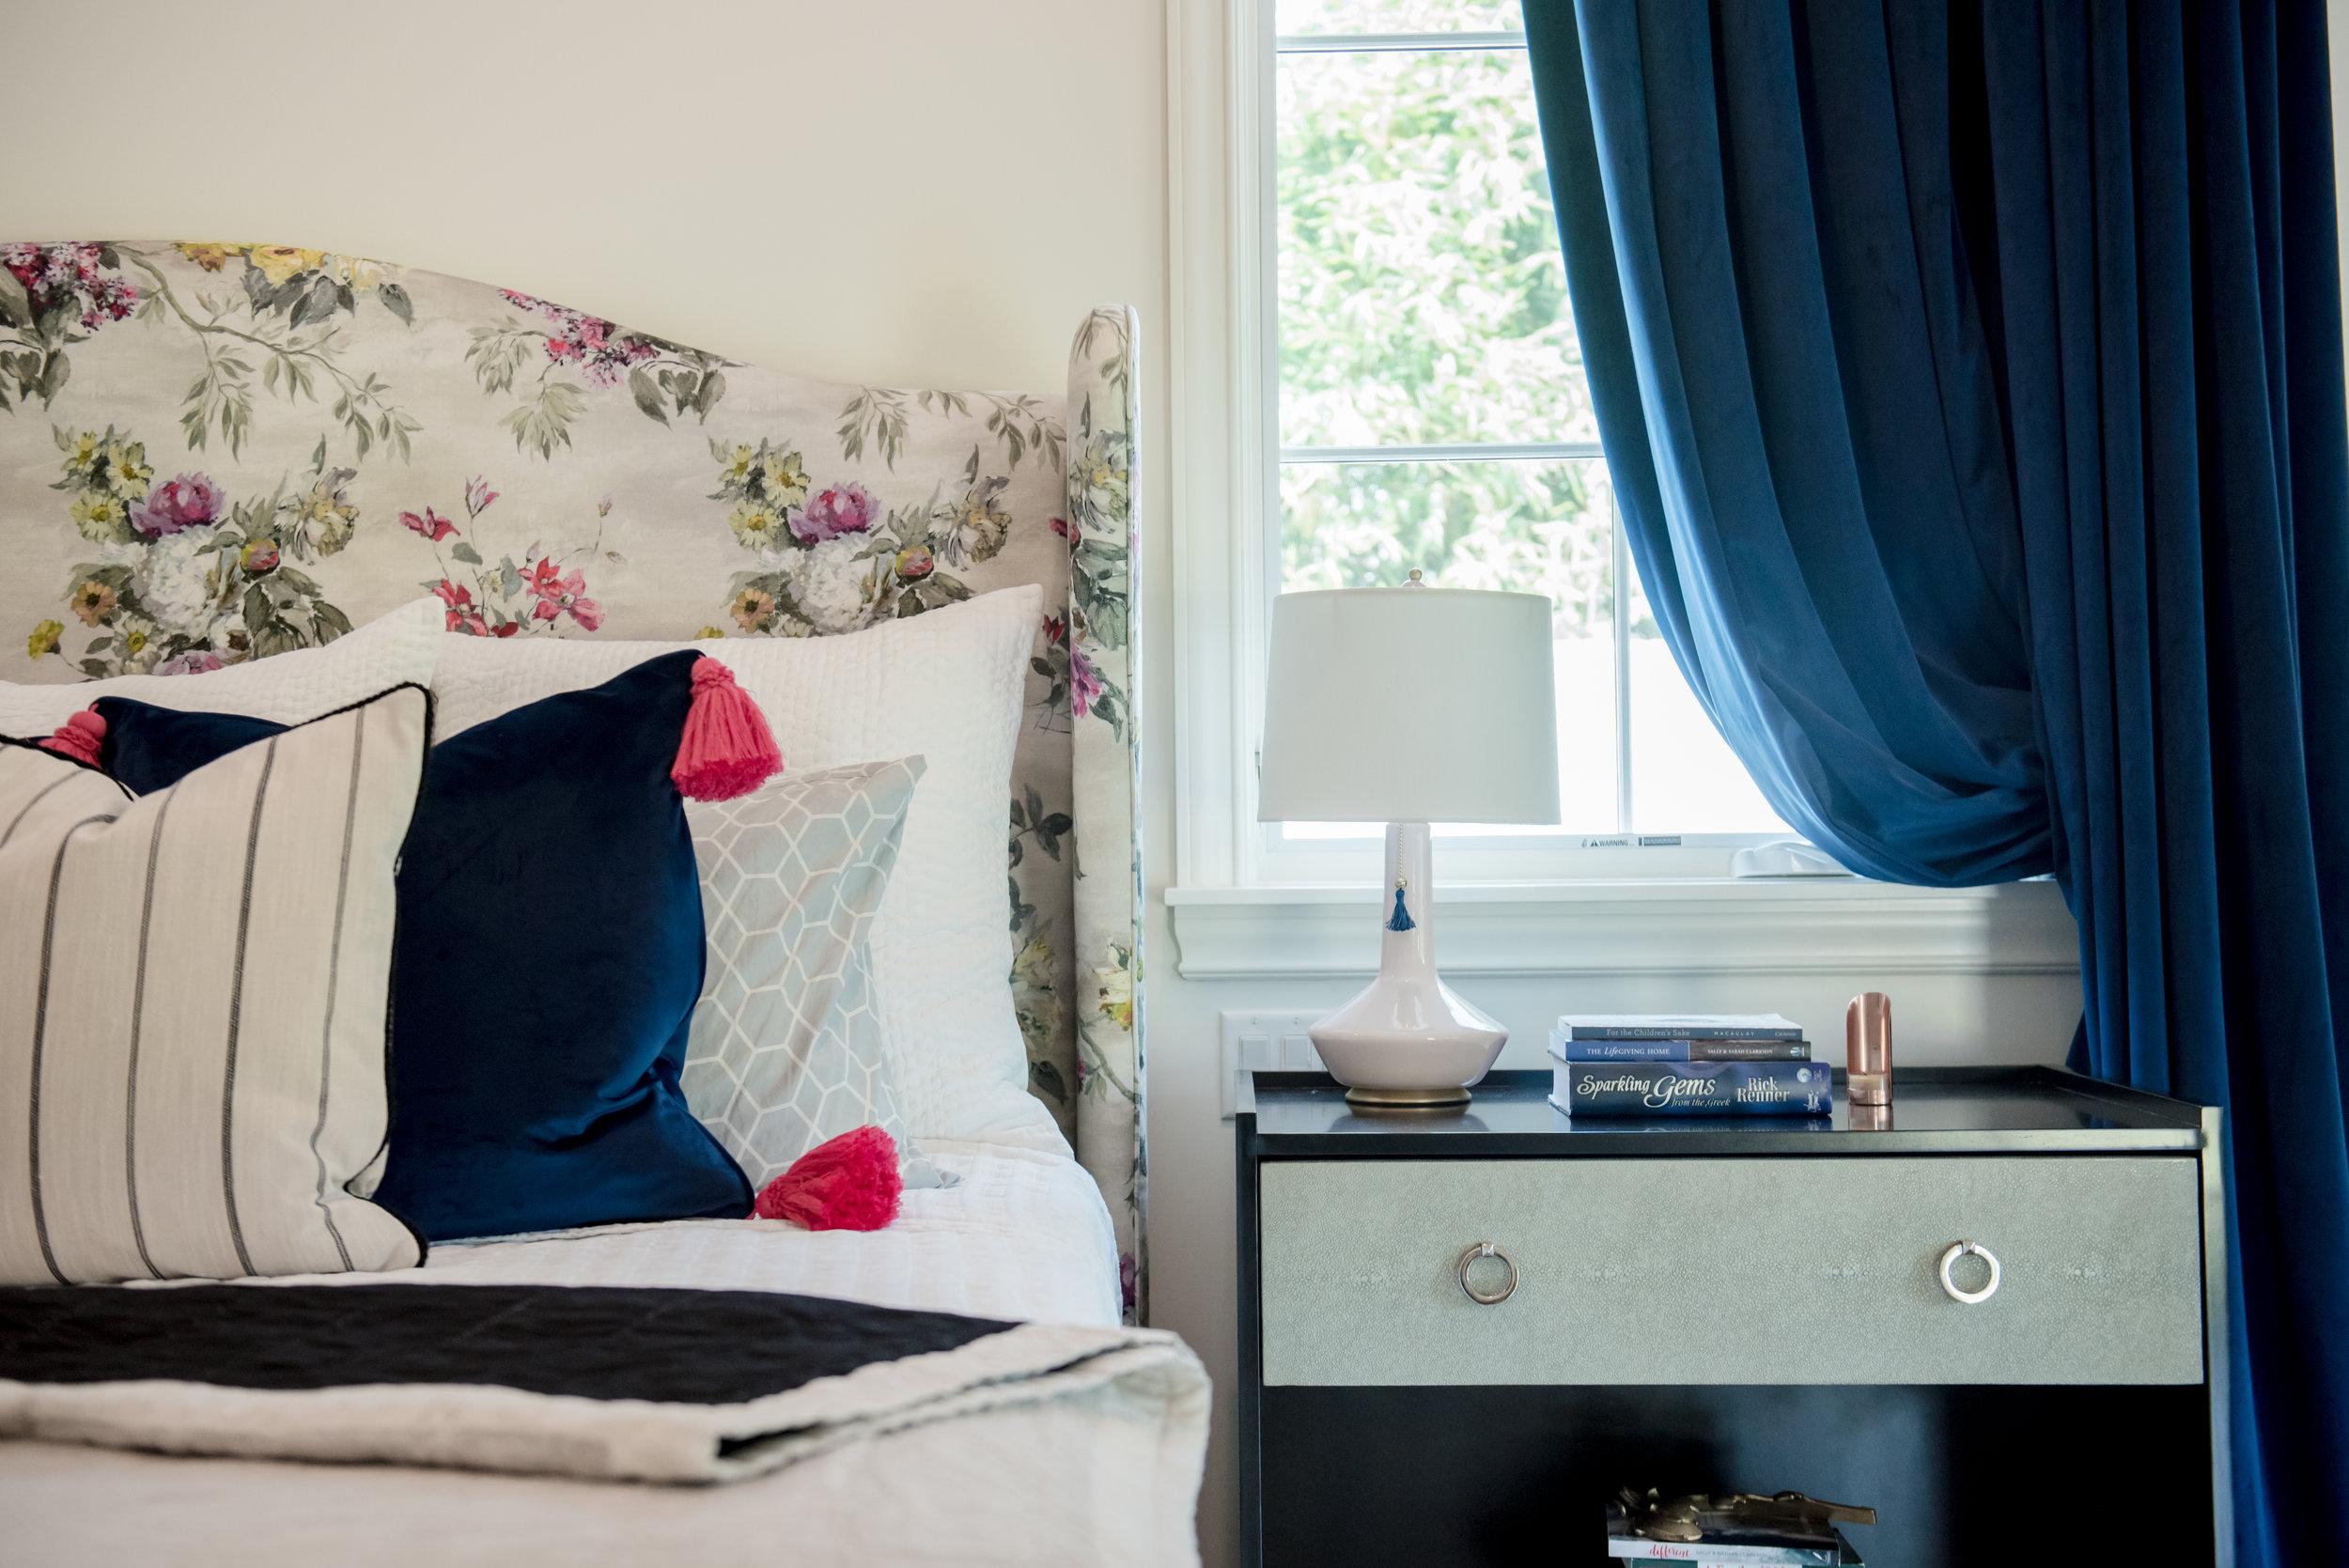 64+Master+Bedroom+Traditional+Floral+Custom+Artwork+Scottsdale+Drapery+Restorationhardware+Crystal.jpg